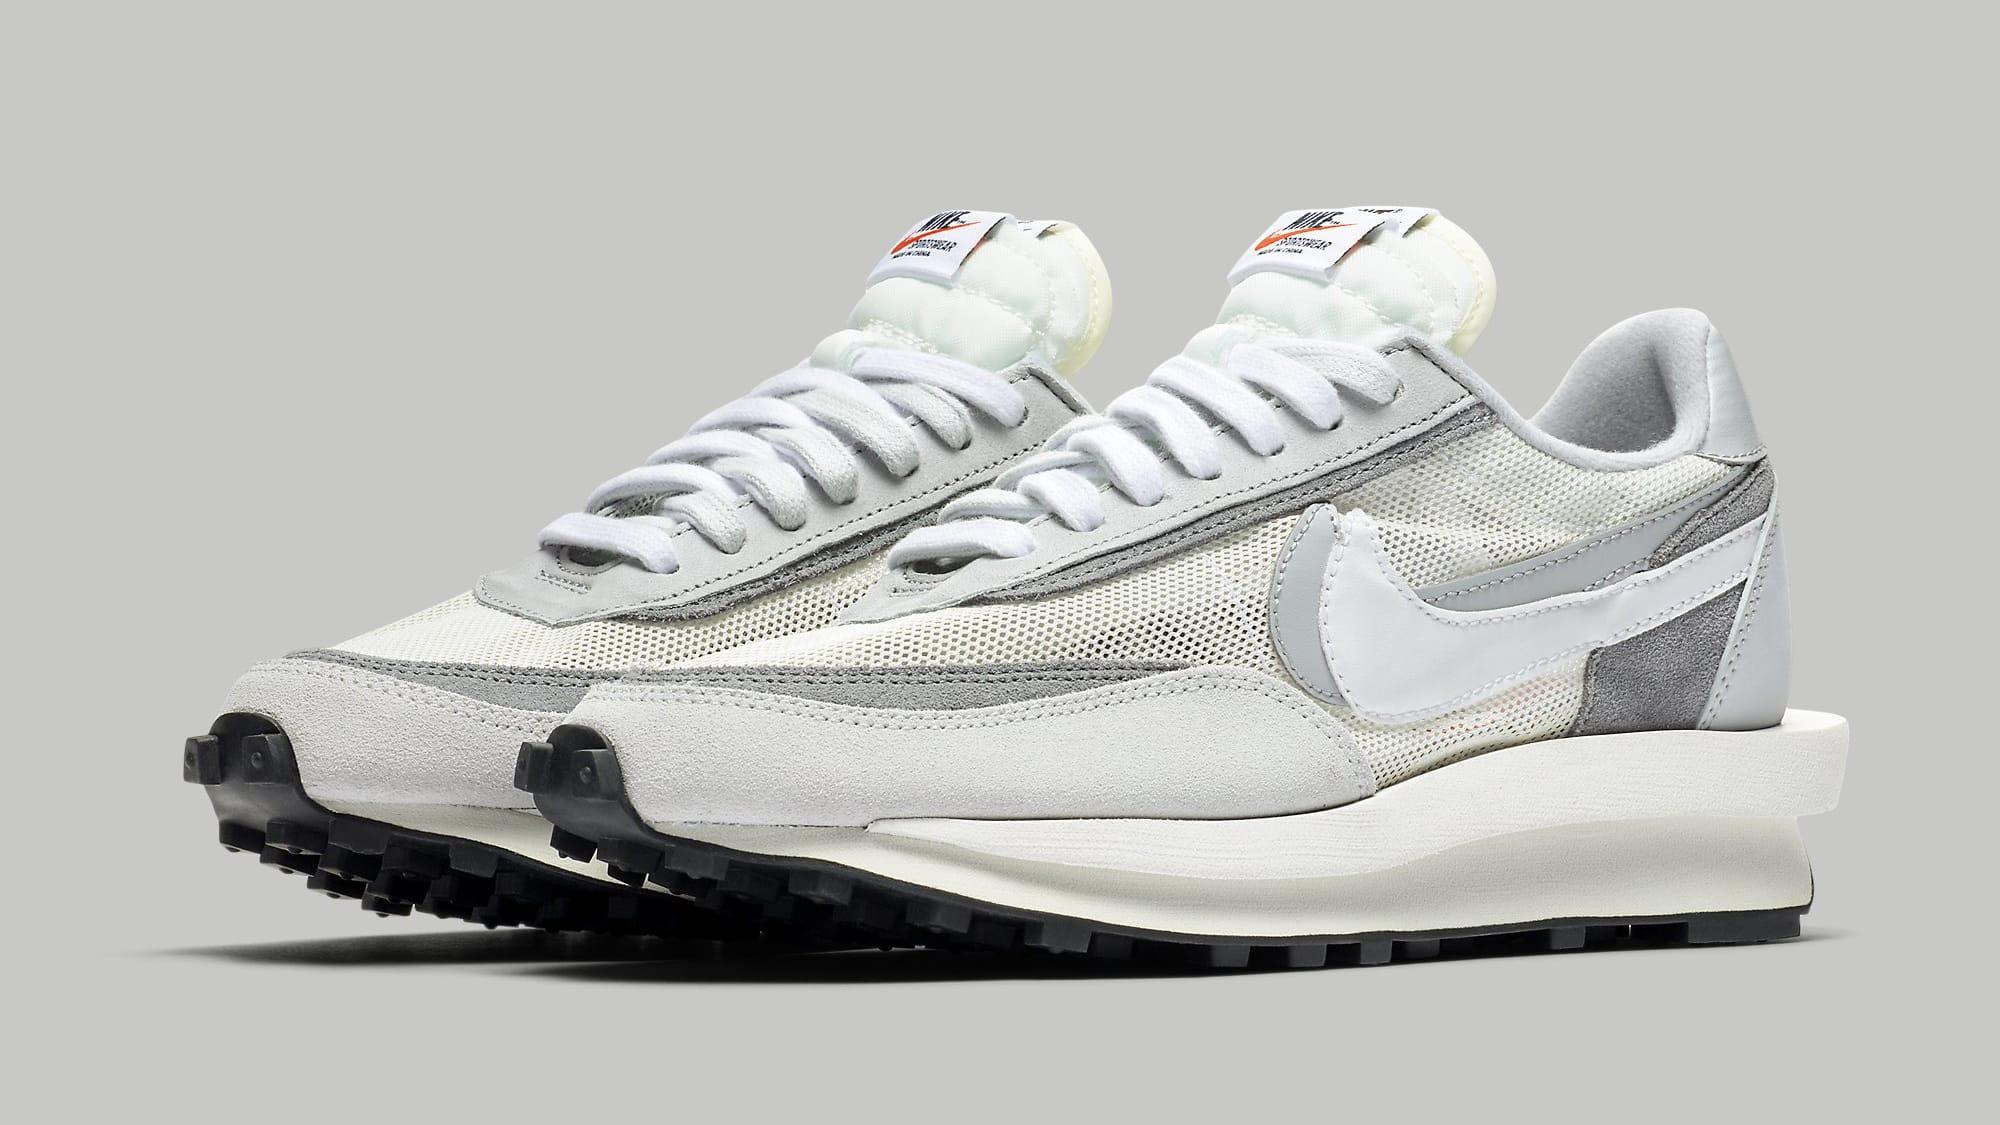 Sacai Nike LDWaffle Summit White Wolf Grey Release Date BV0073-100 Pair